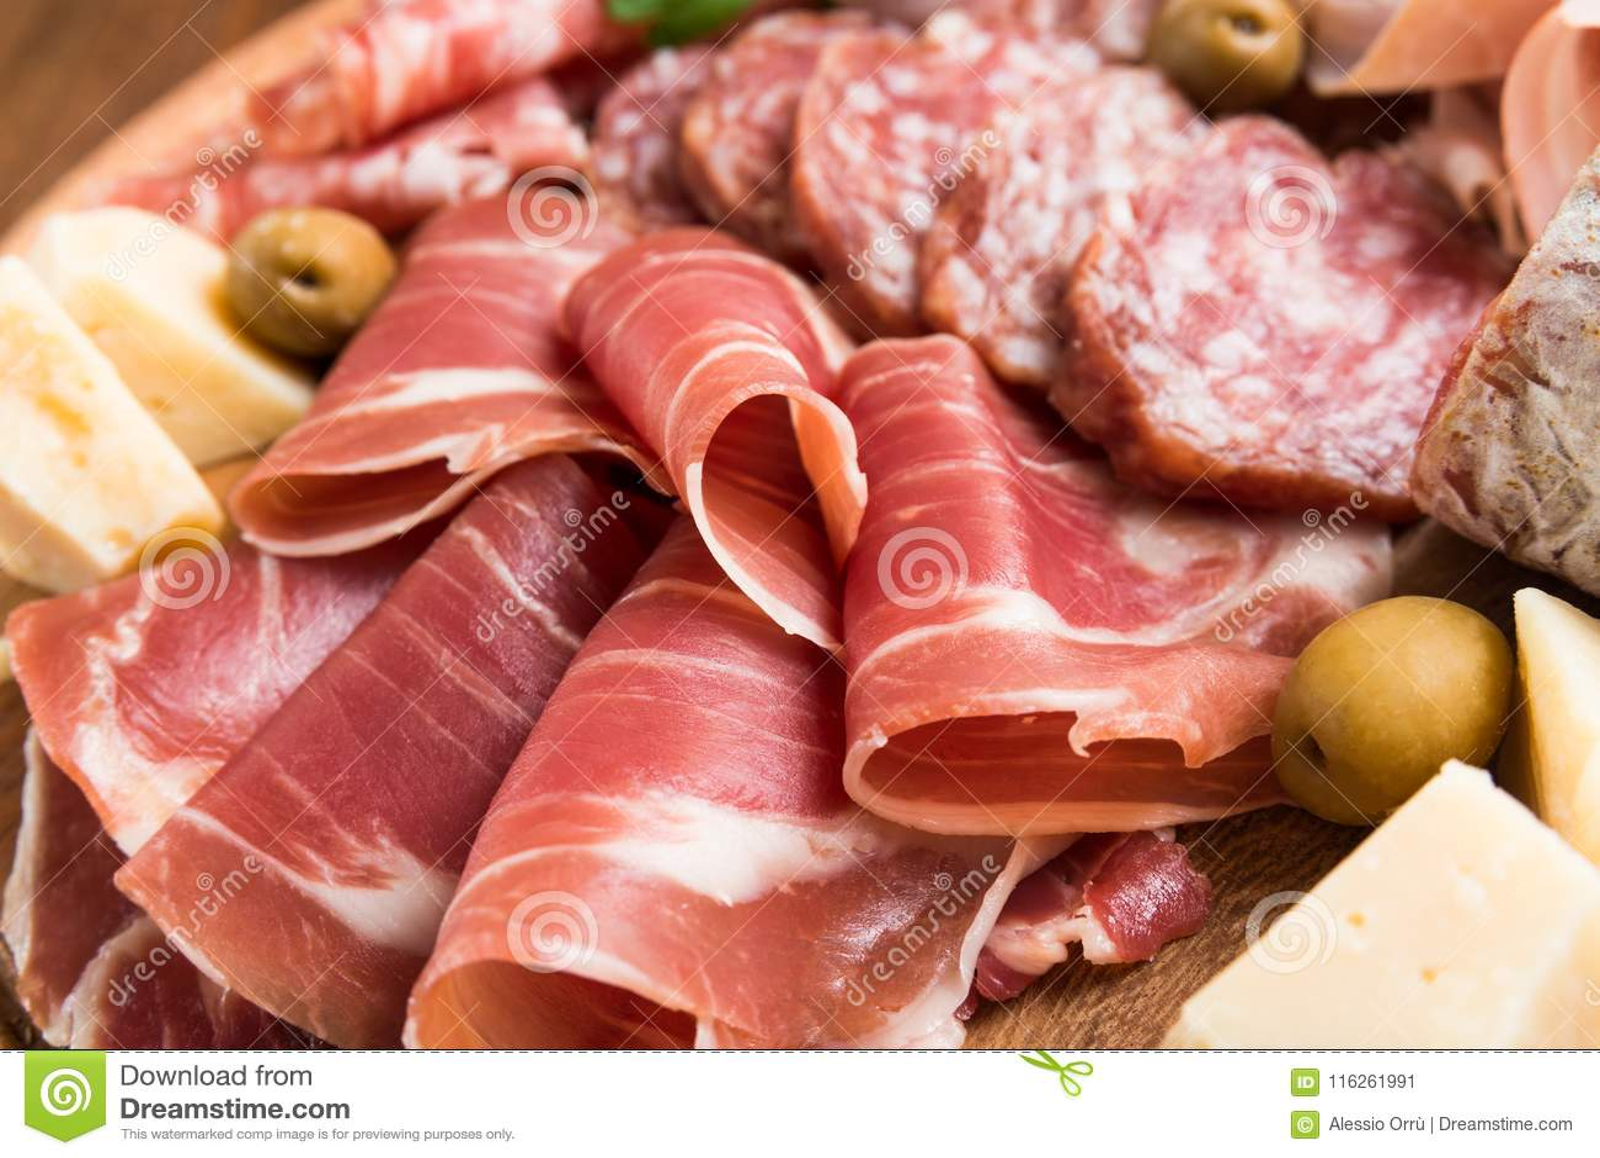 Italian Appetizers Platter Stock Image Image Of Foodie 116261991